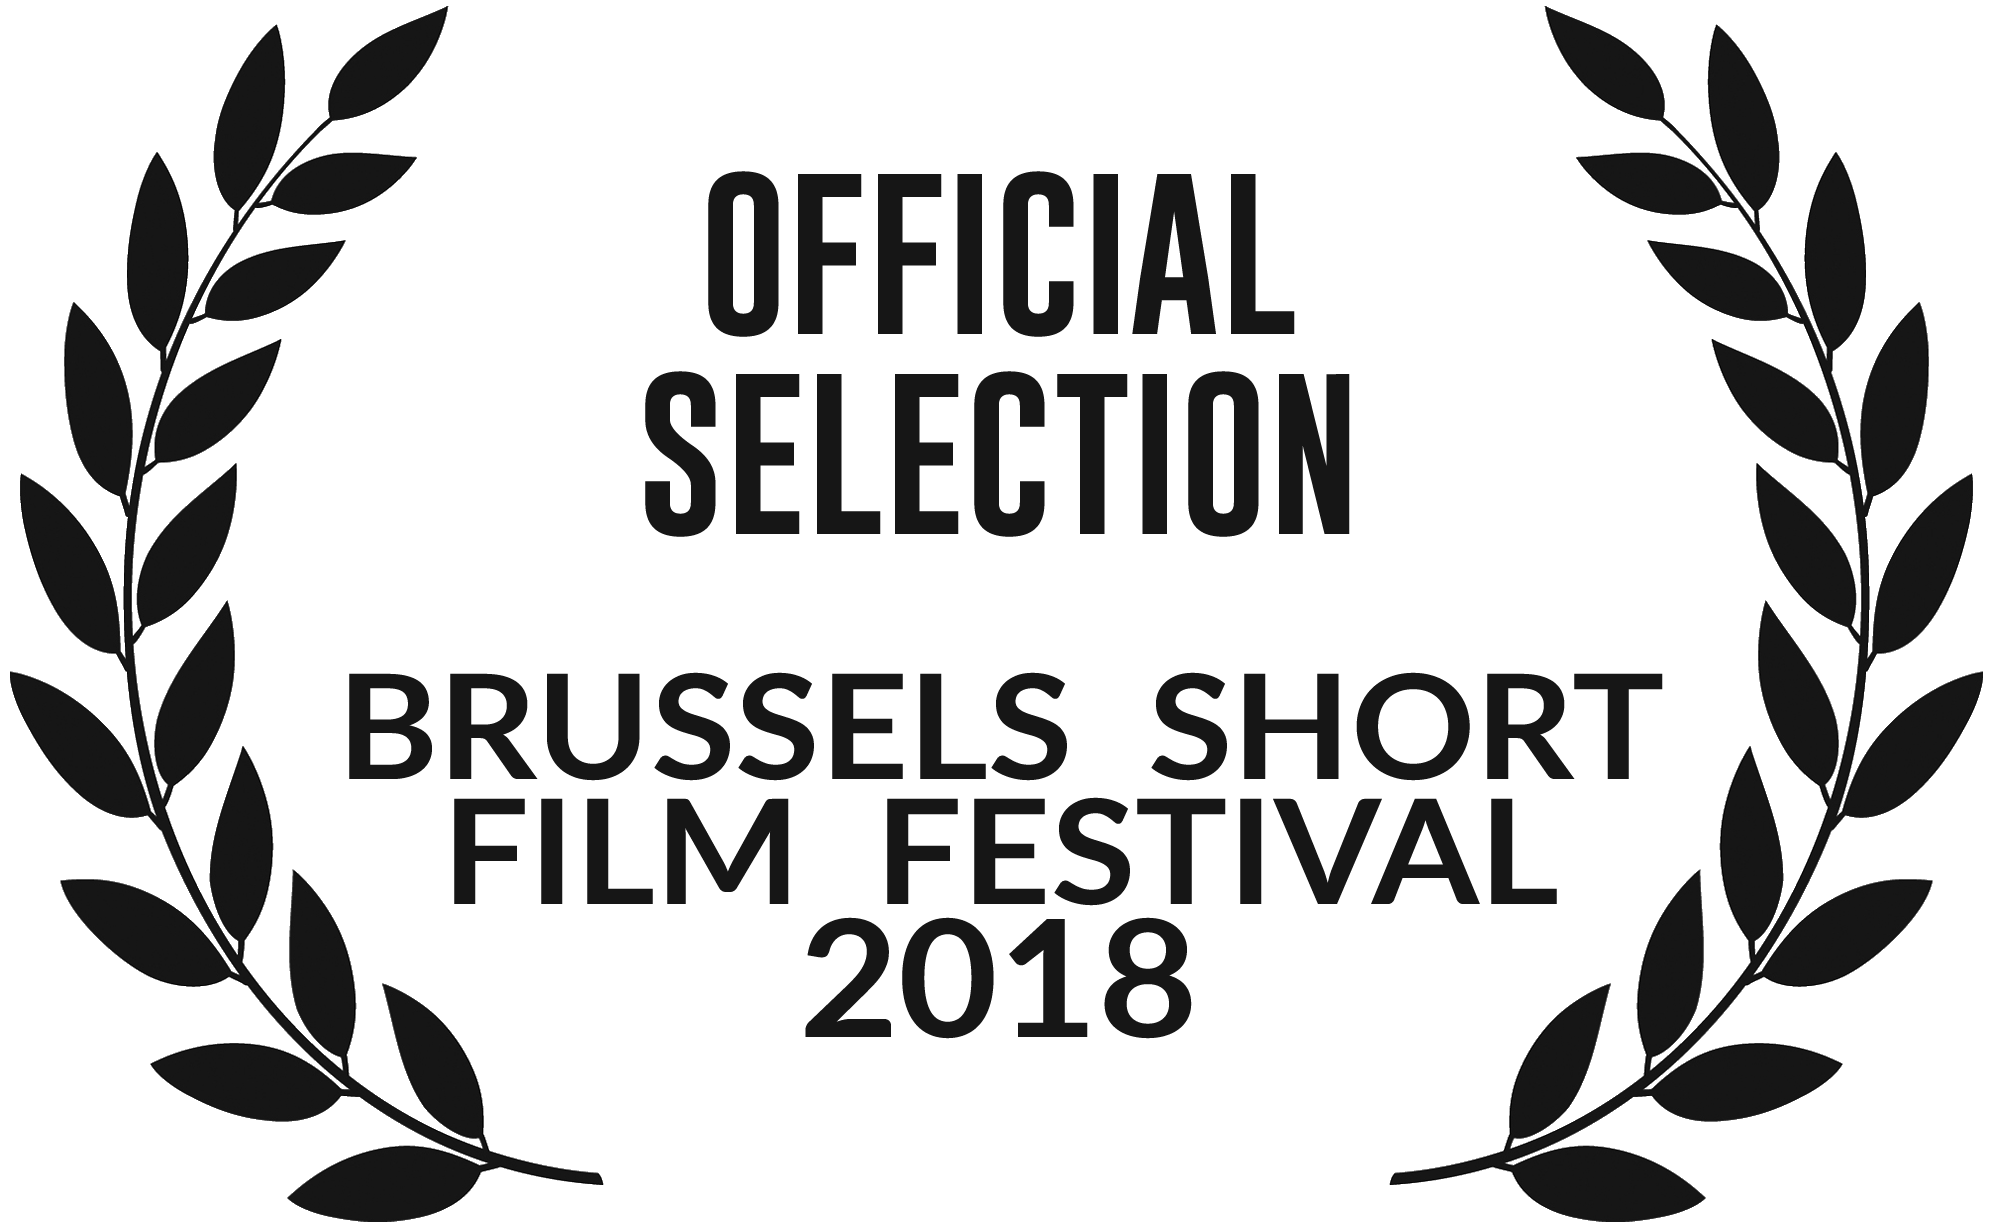 OFFICIAL SELECTION BSFF 2018 - laurels.png